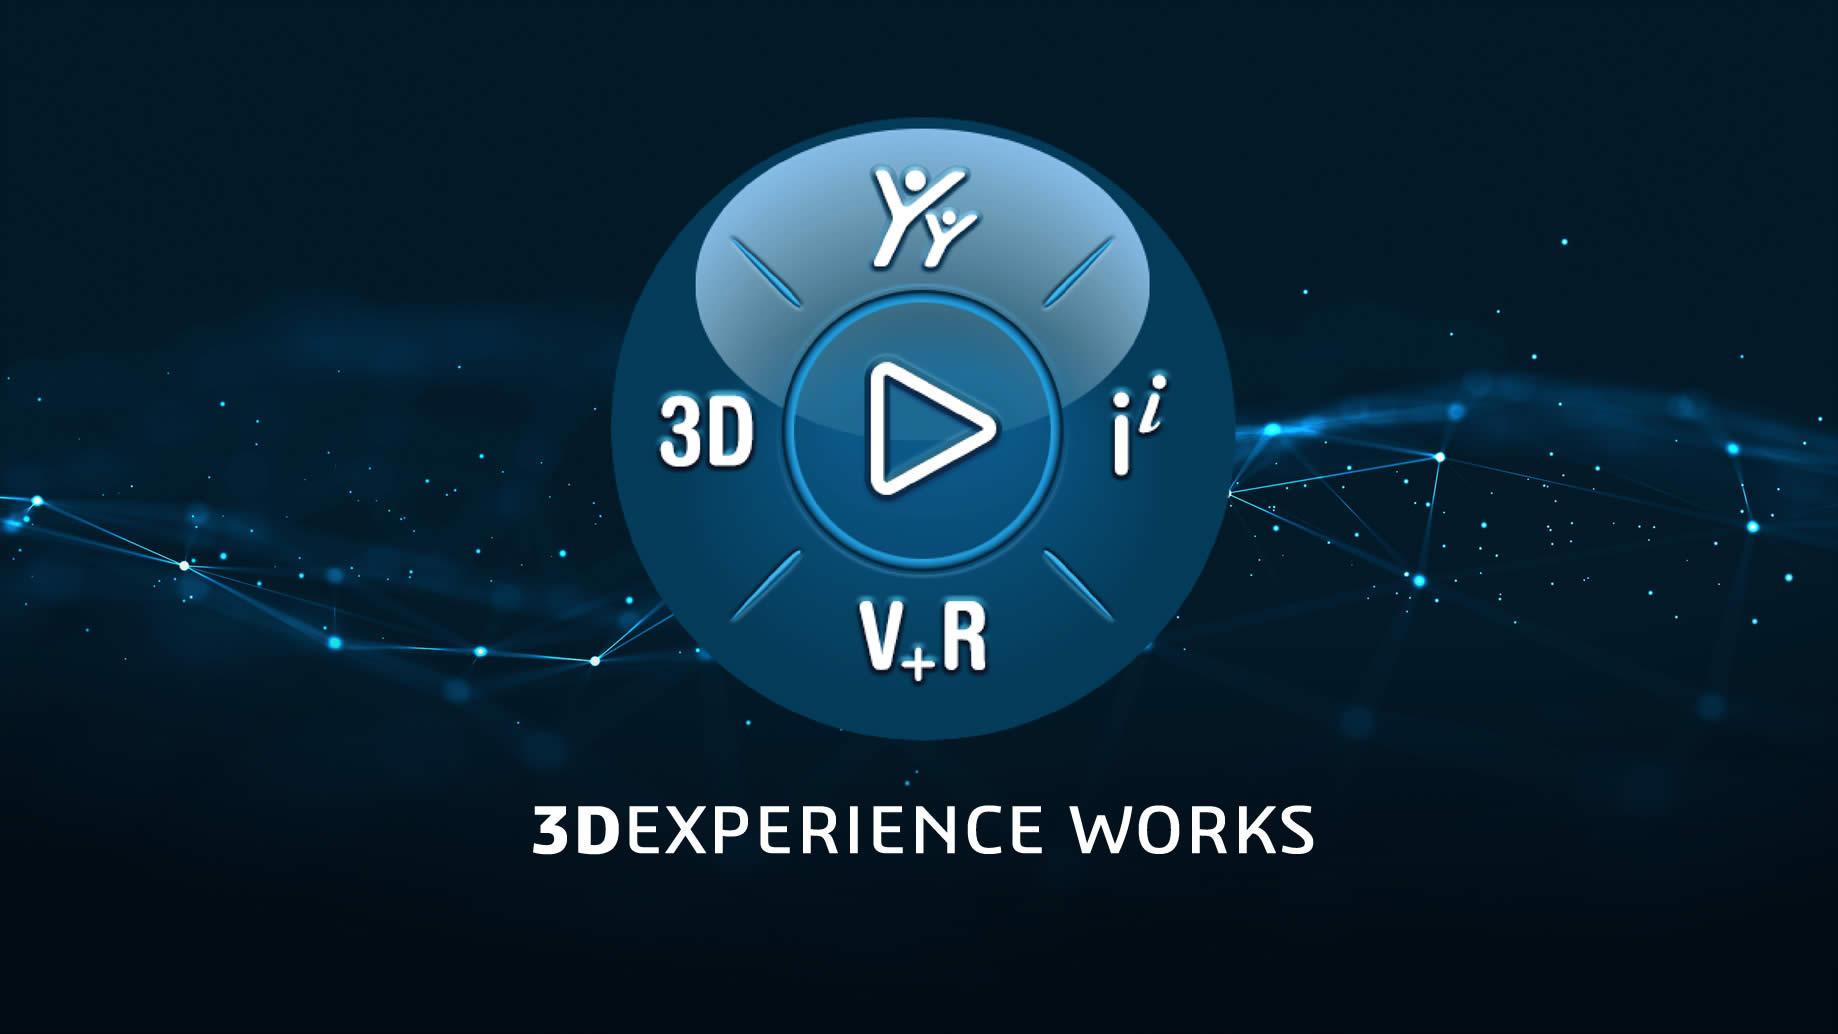 3DEXPERIENCE REVOLUTION